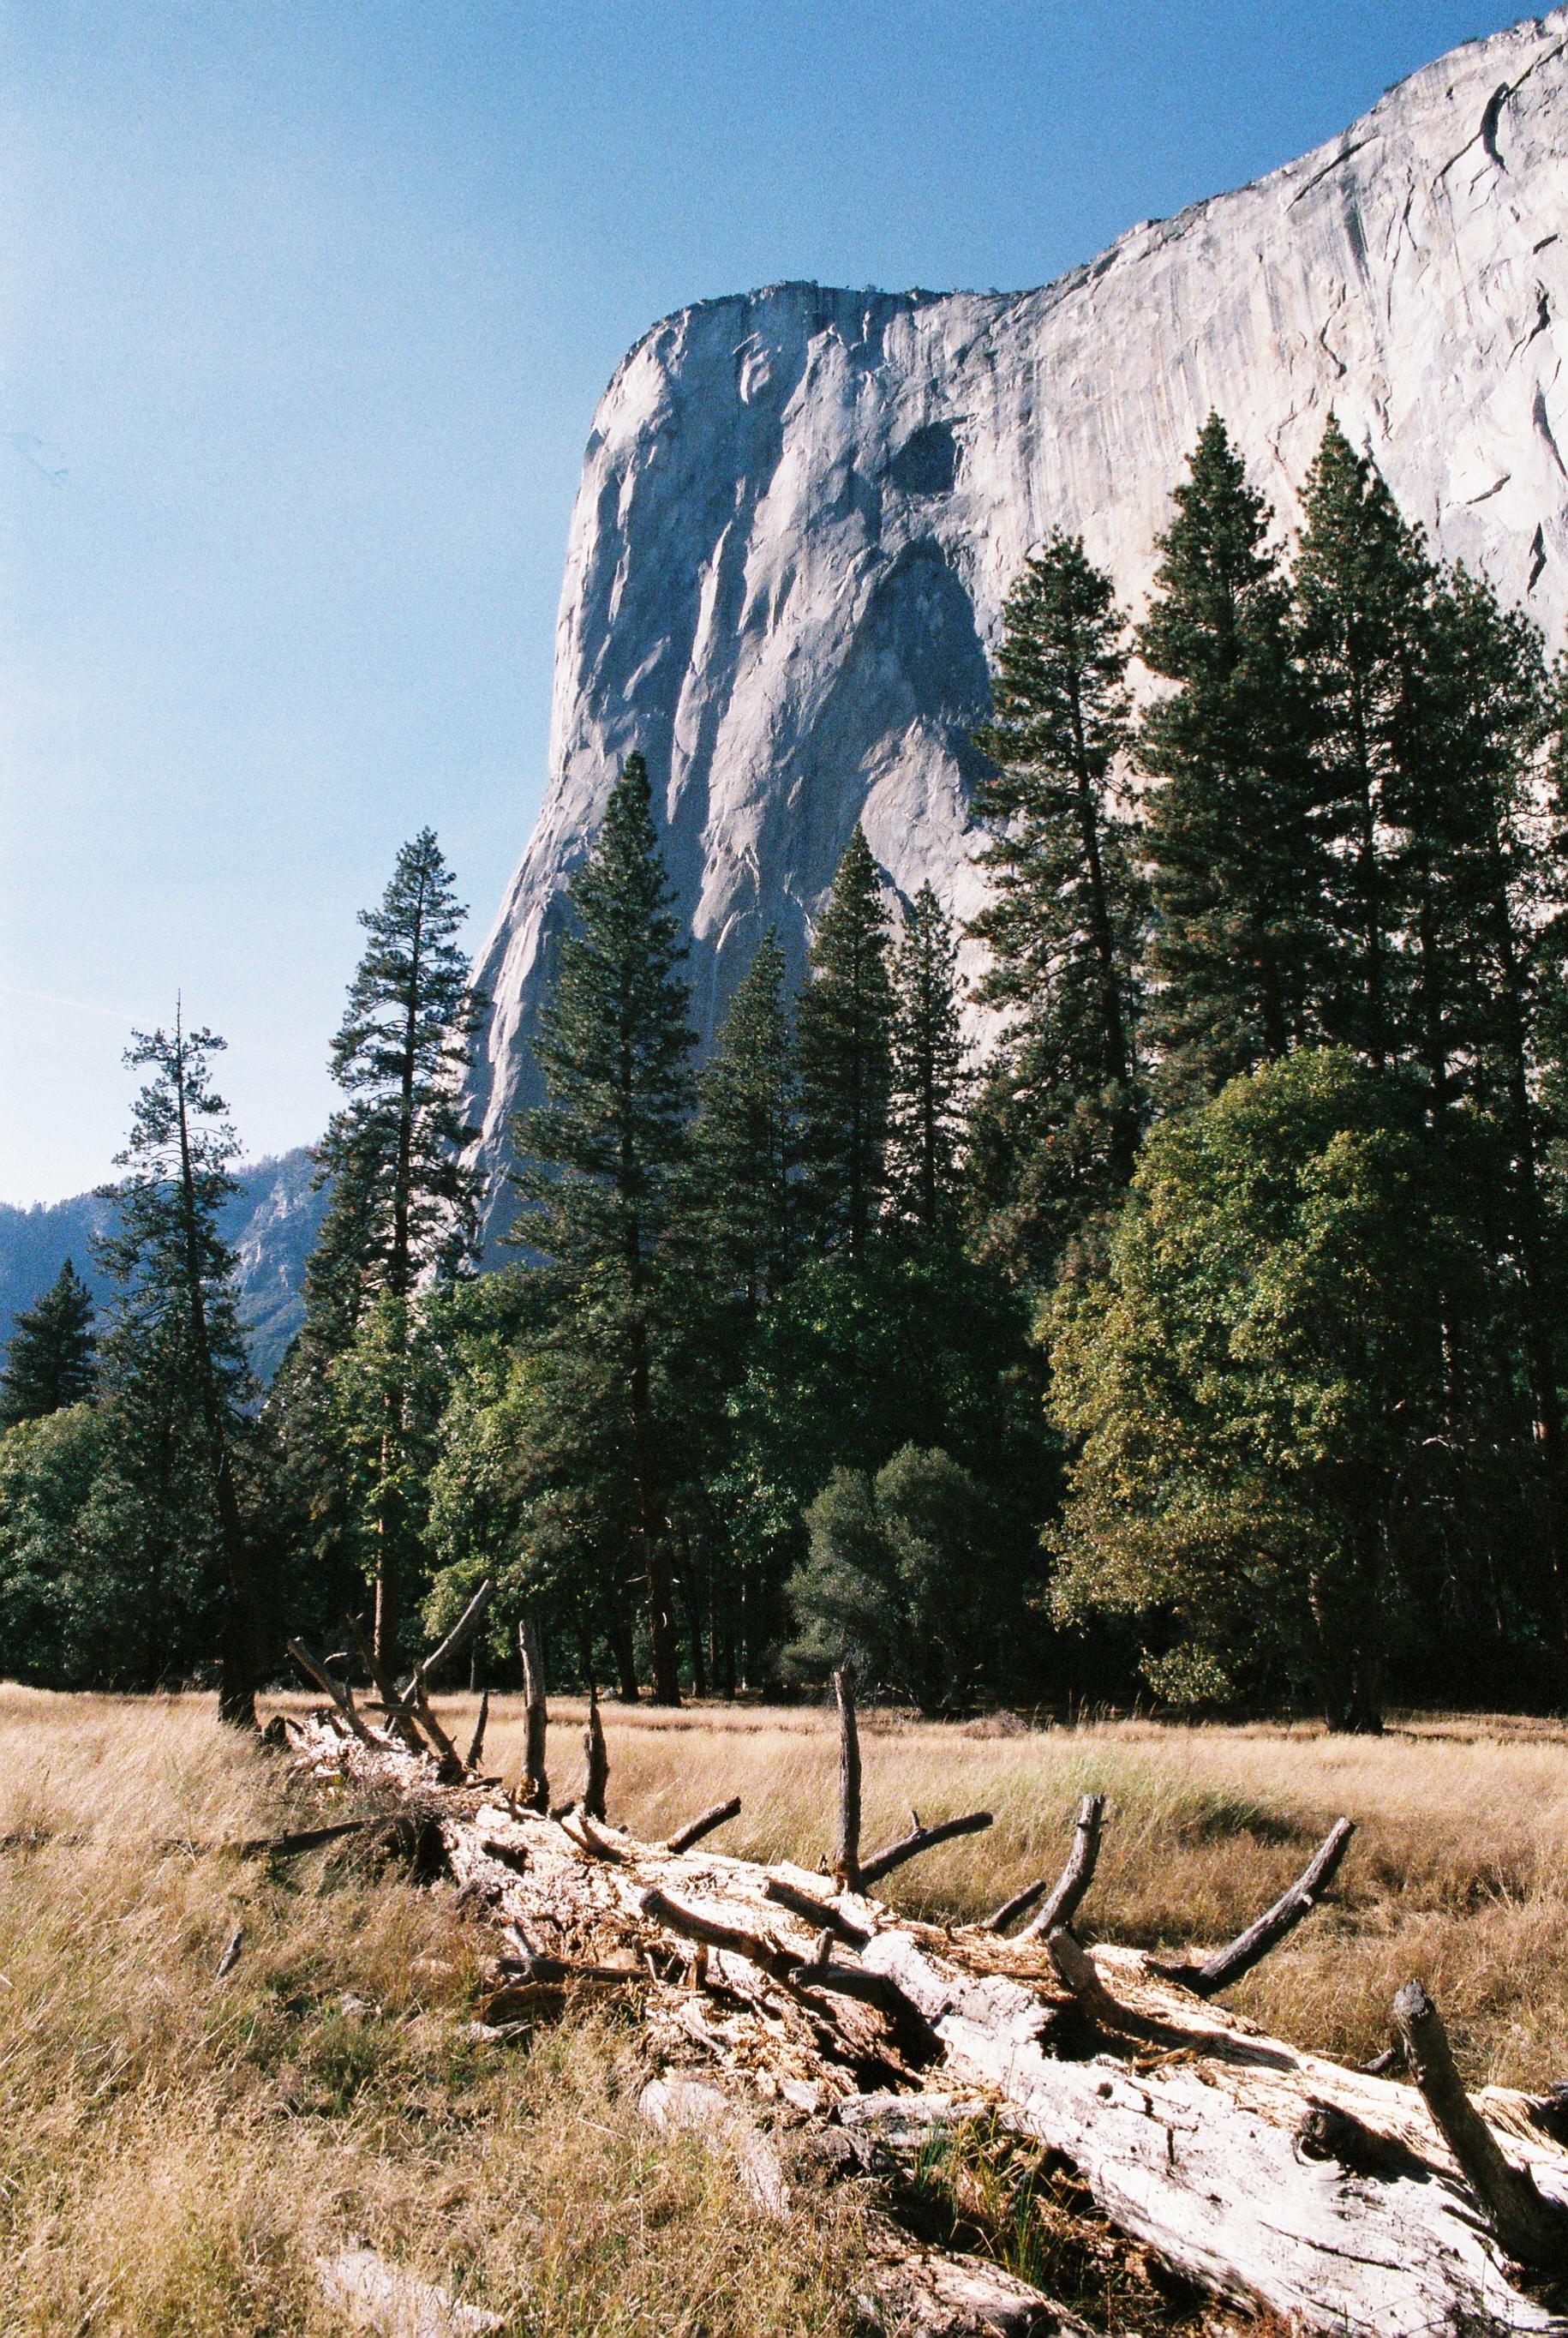 Yosemite National Park, California, USA   Olympus OM-2n